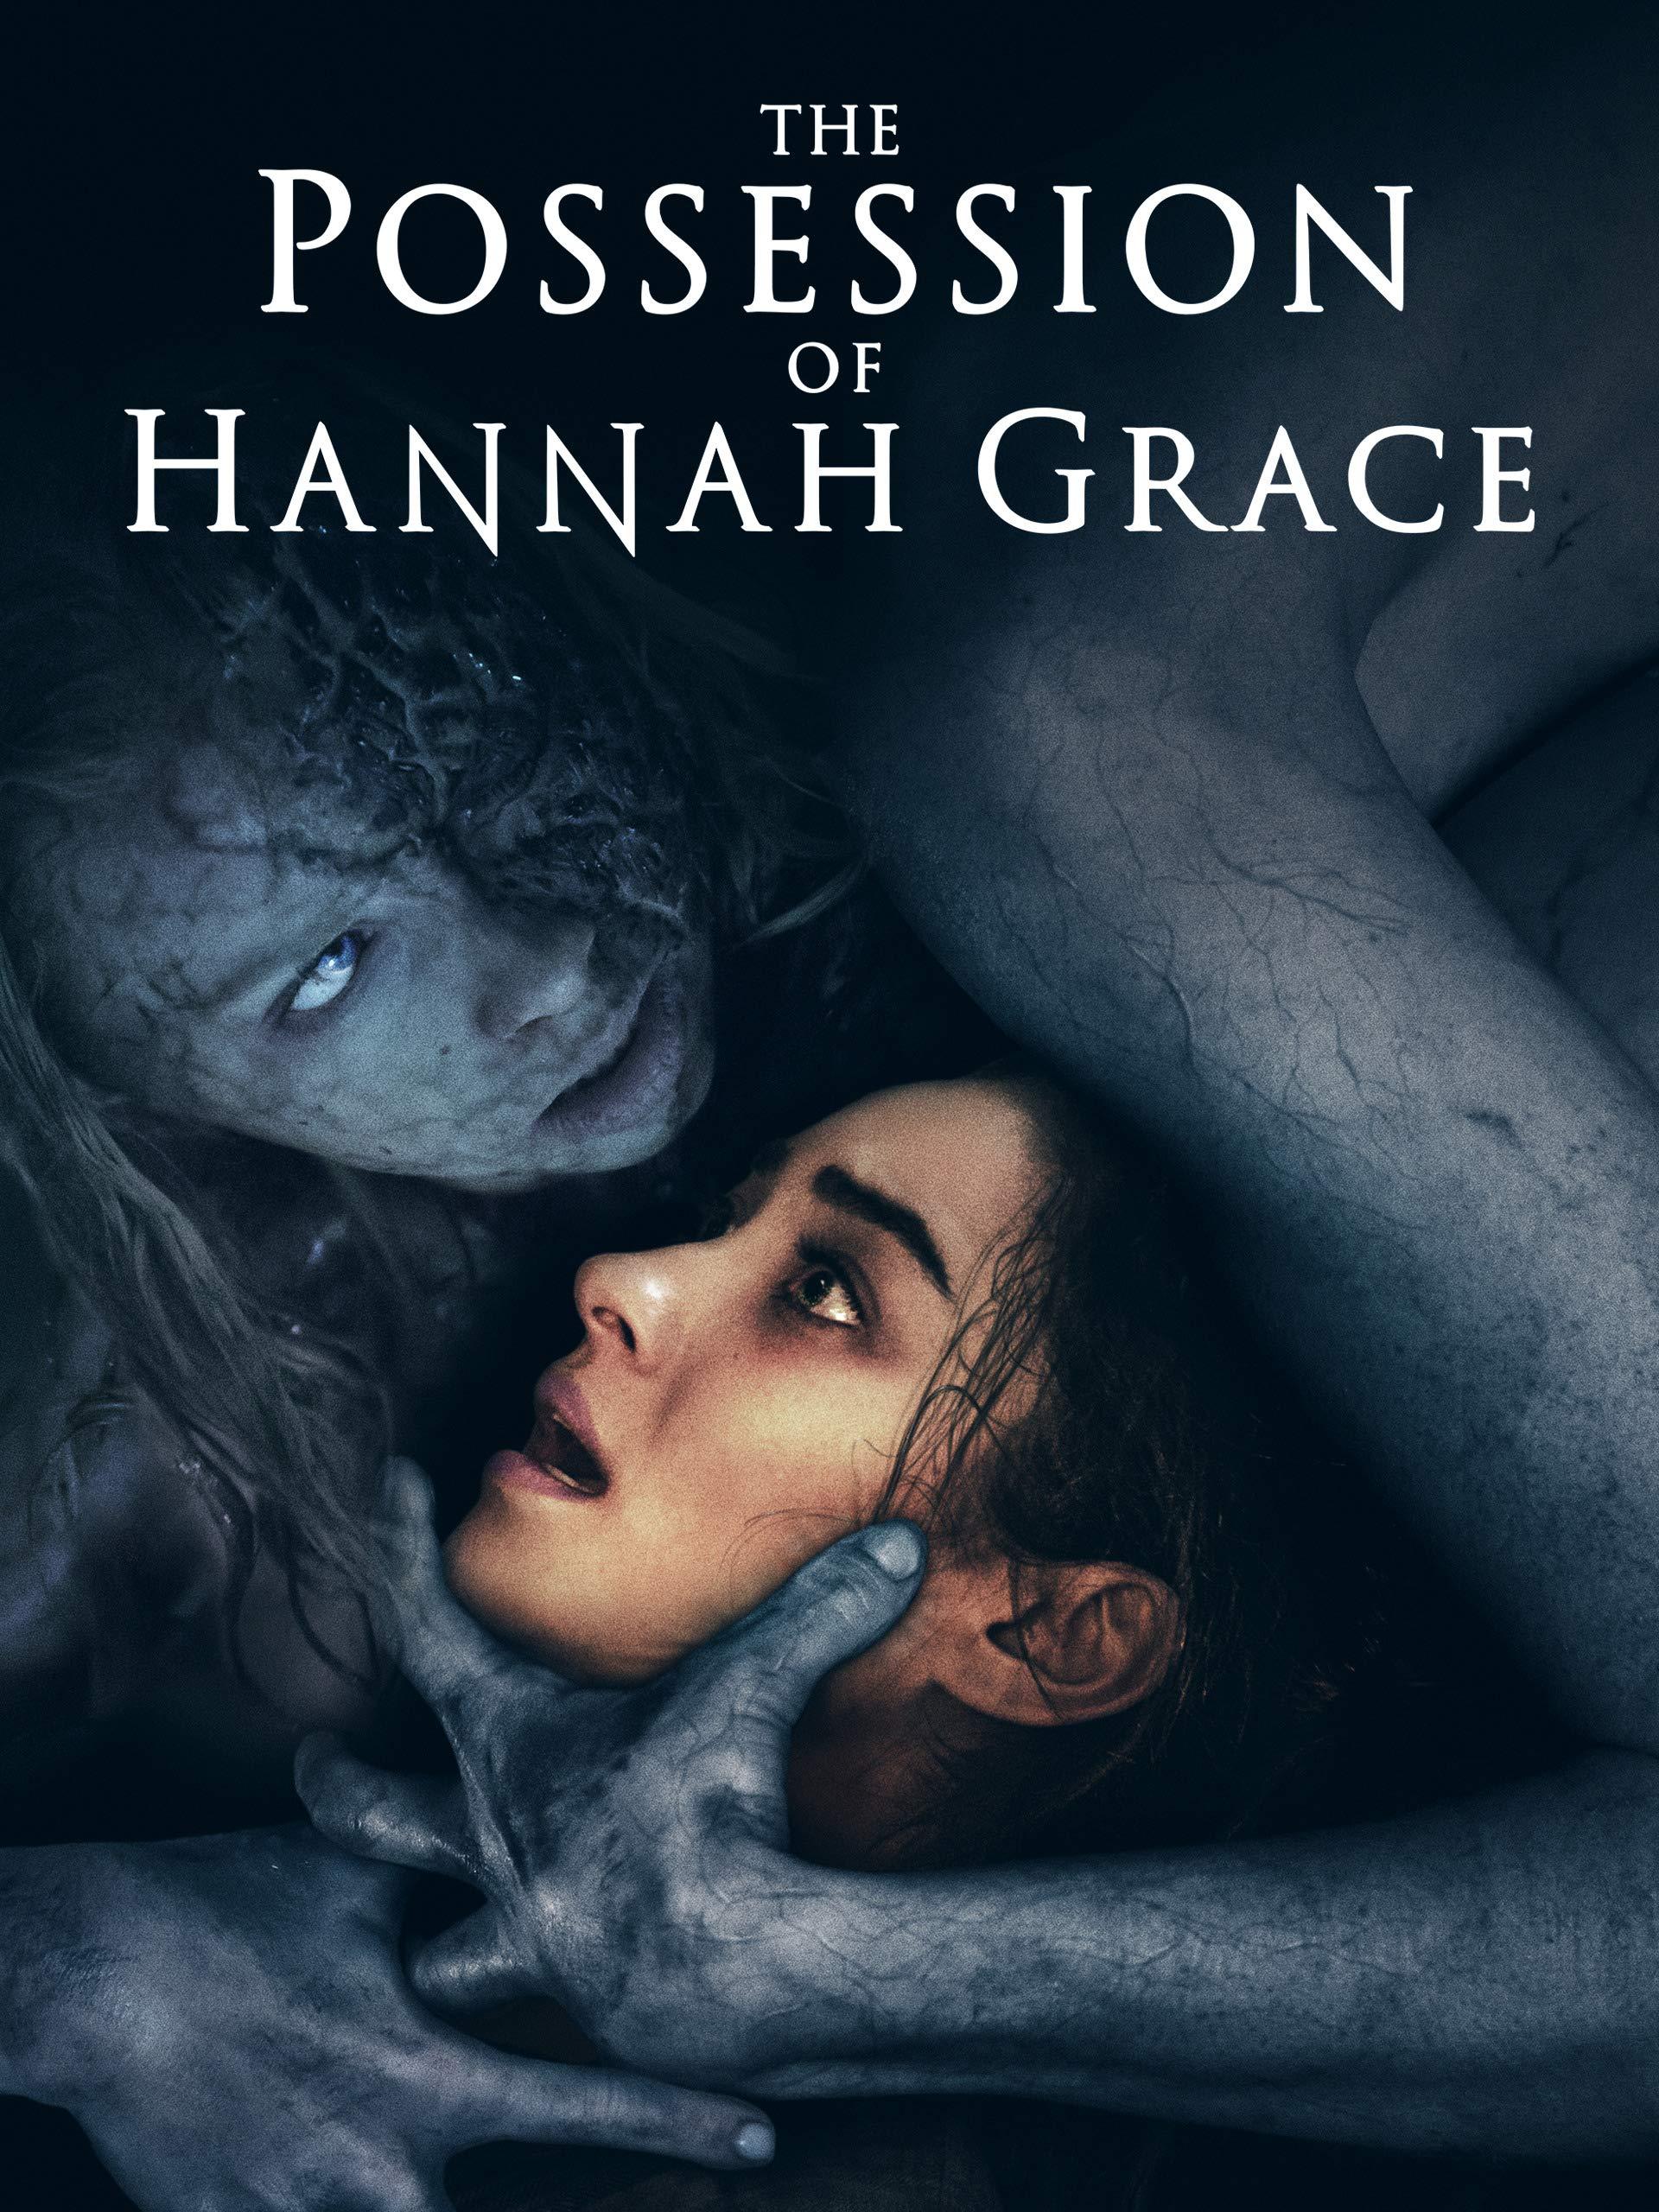 Amazon.com: The Possession Of Hannah Grace: Stana Katic, Grey Damon ...